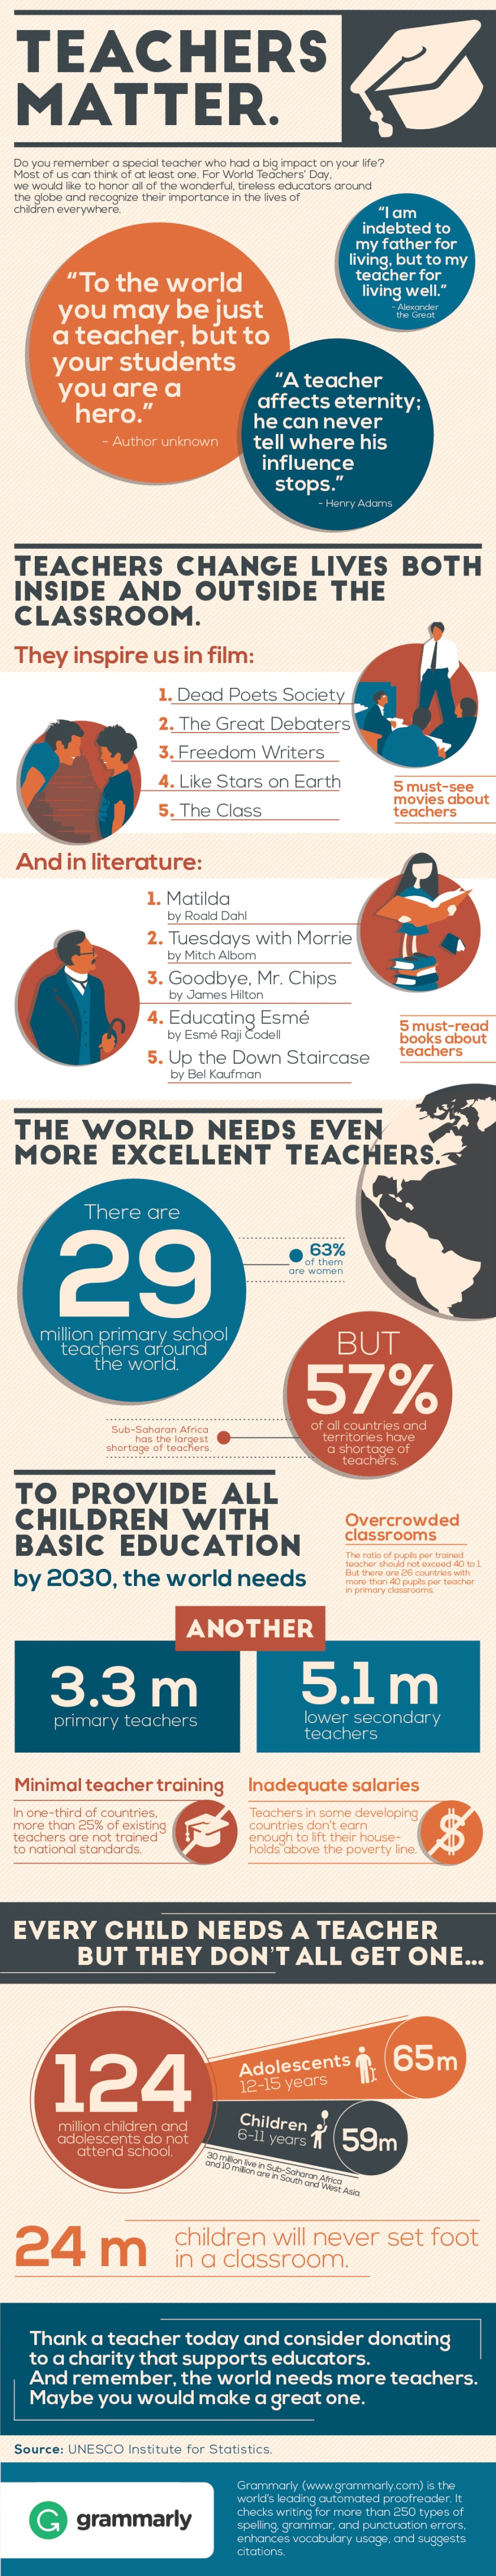 151005 World-Teacher-Day-infographic